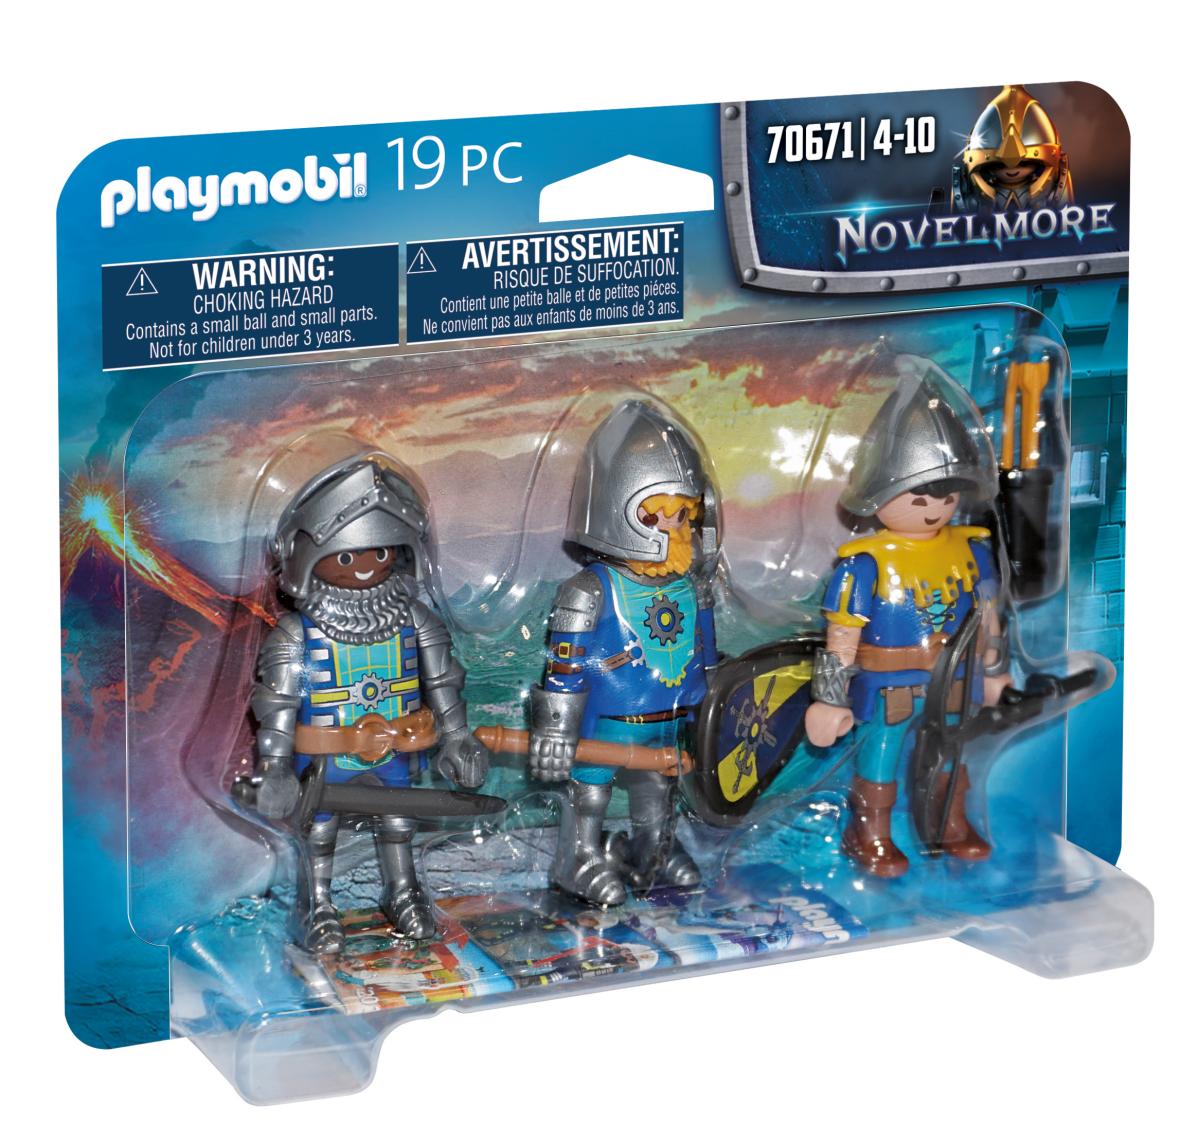 Cavalieri di novelmore - Playmobil